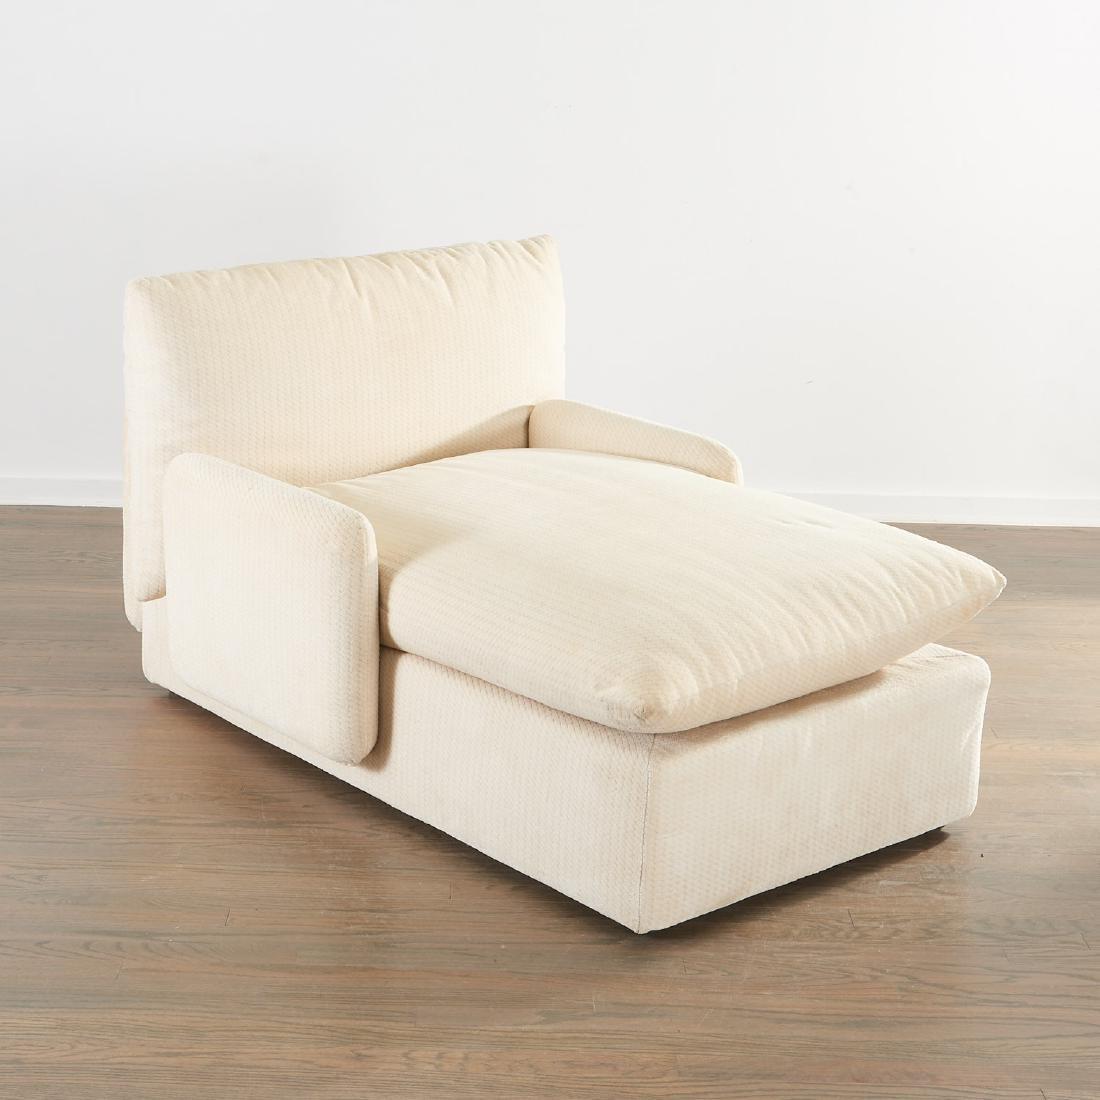 Gae Aulenti upholstered chaise longue